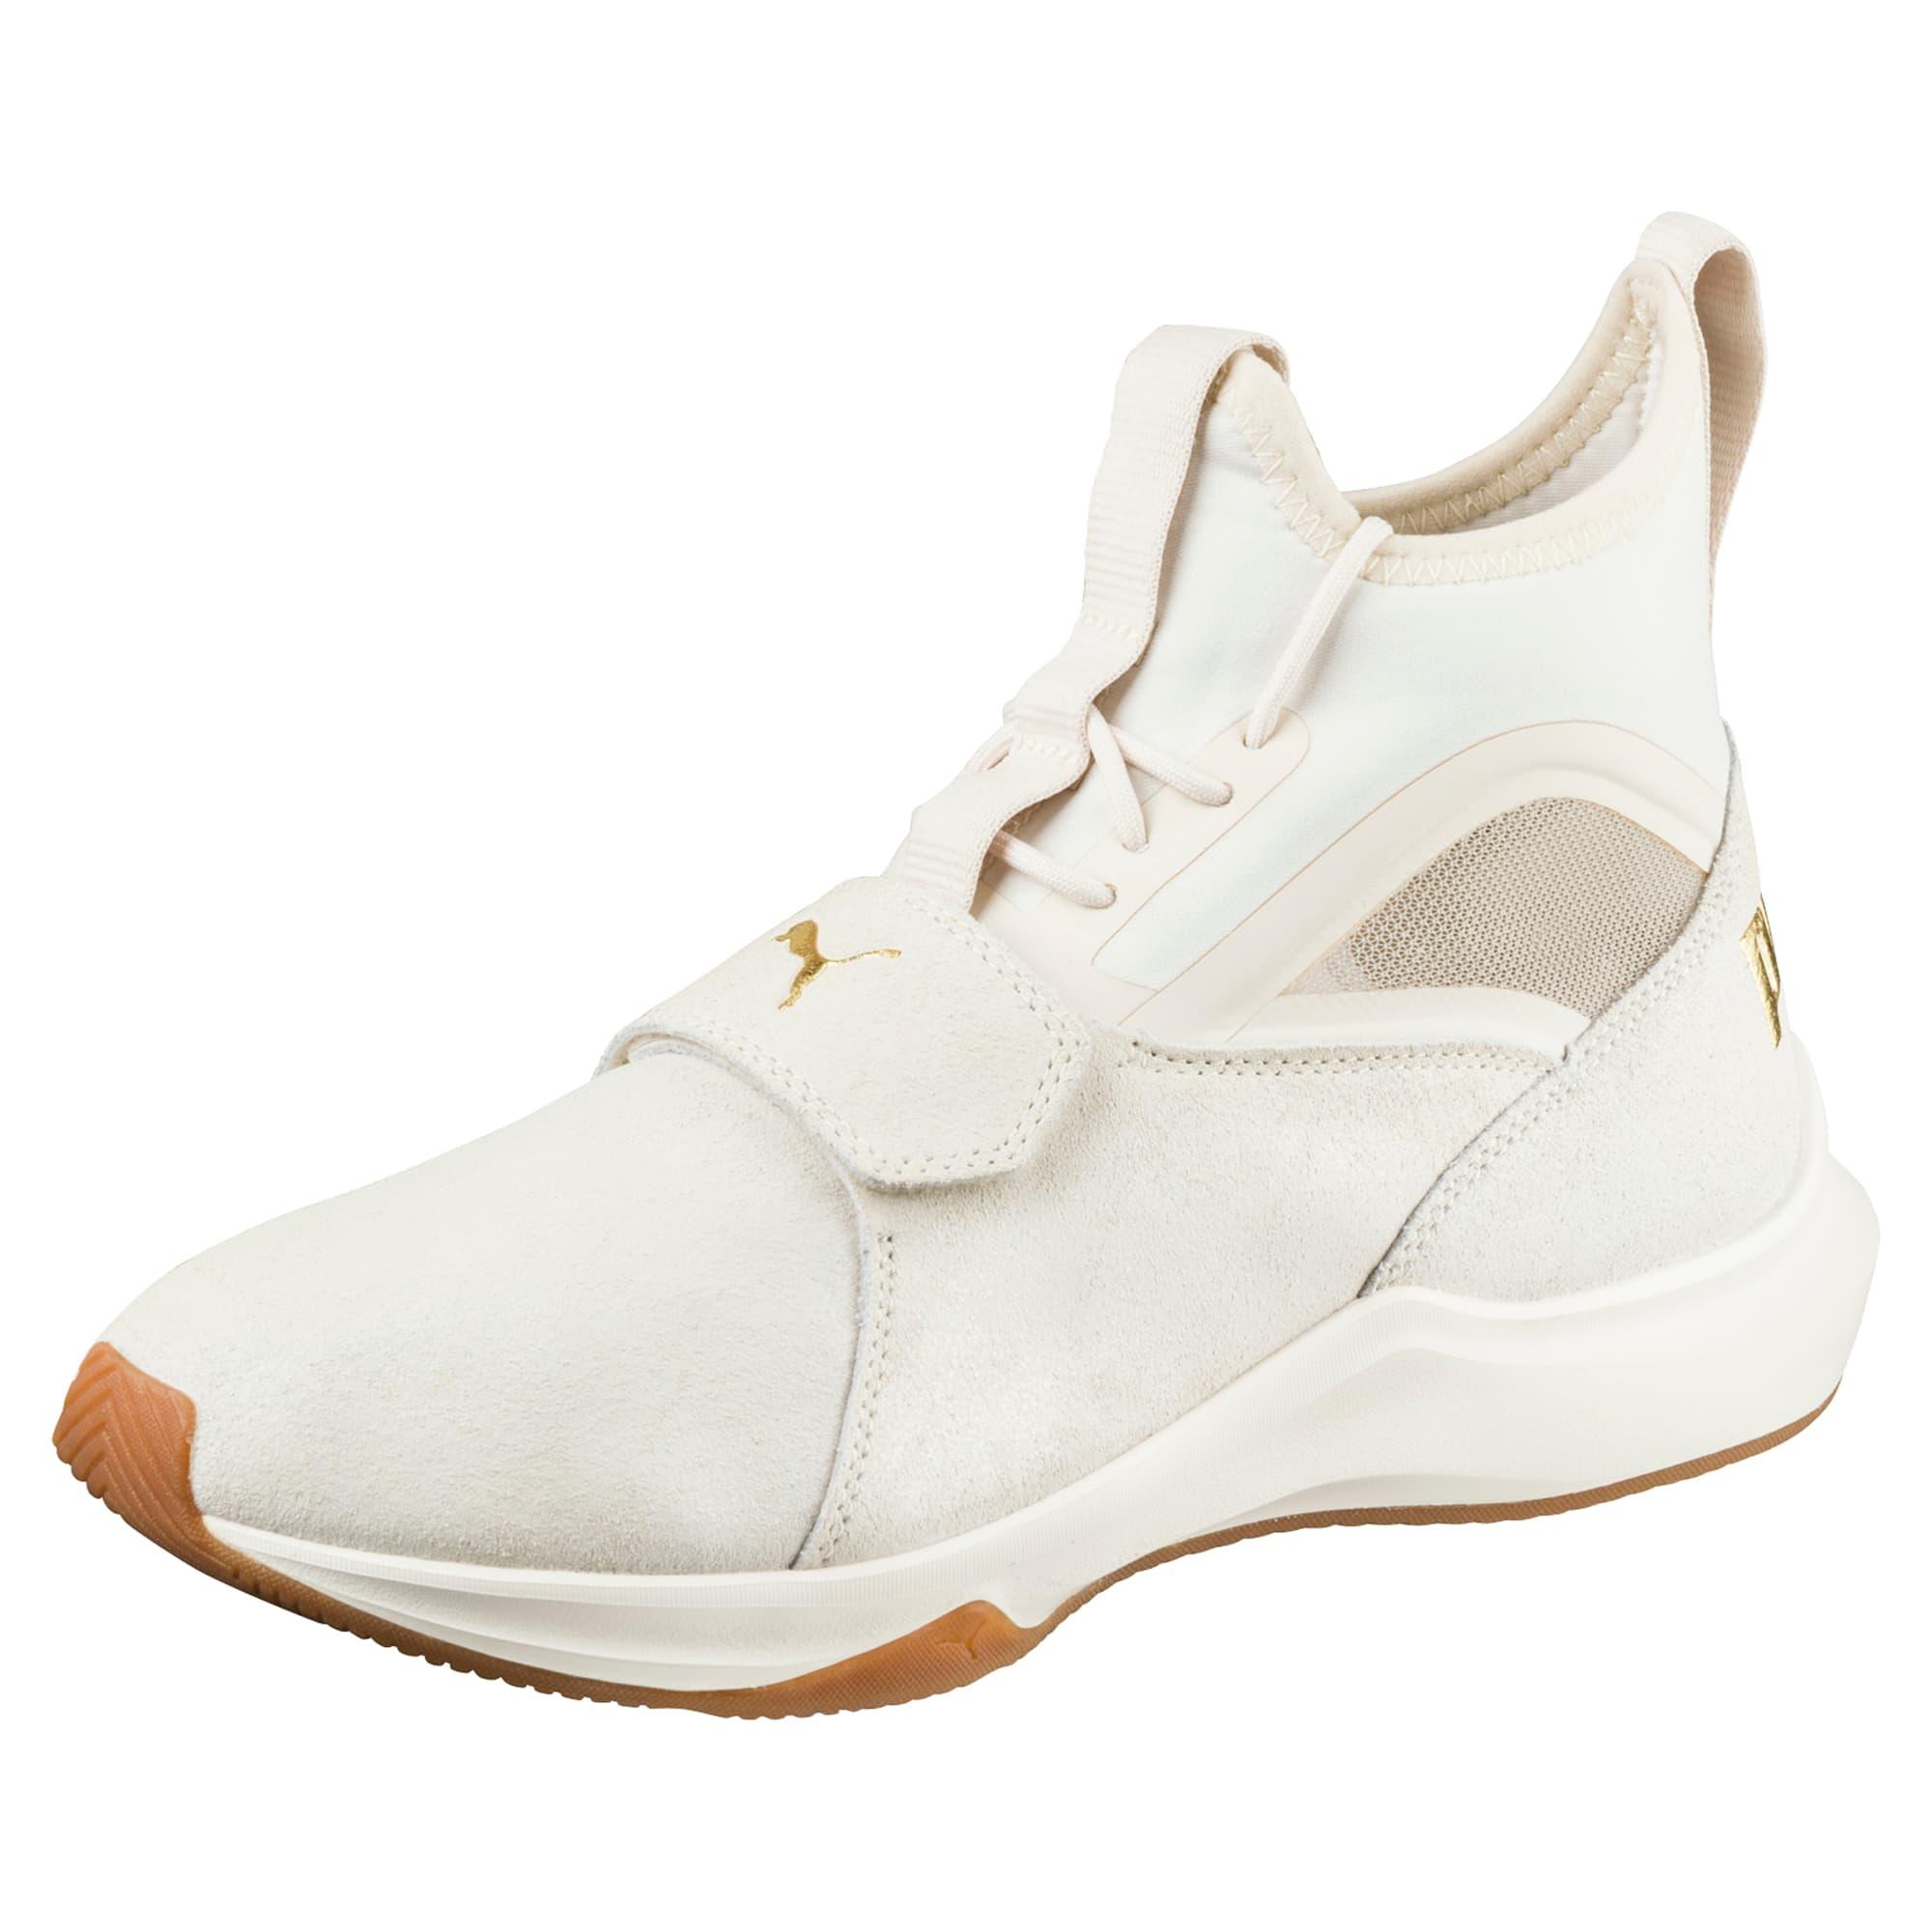 Phenom Womens Training Shoes Women's Footwear from Puma